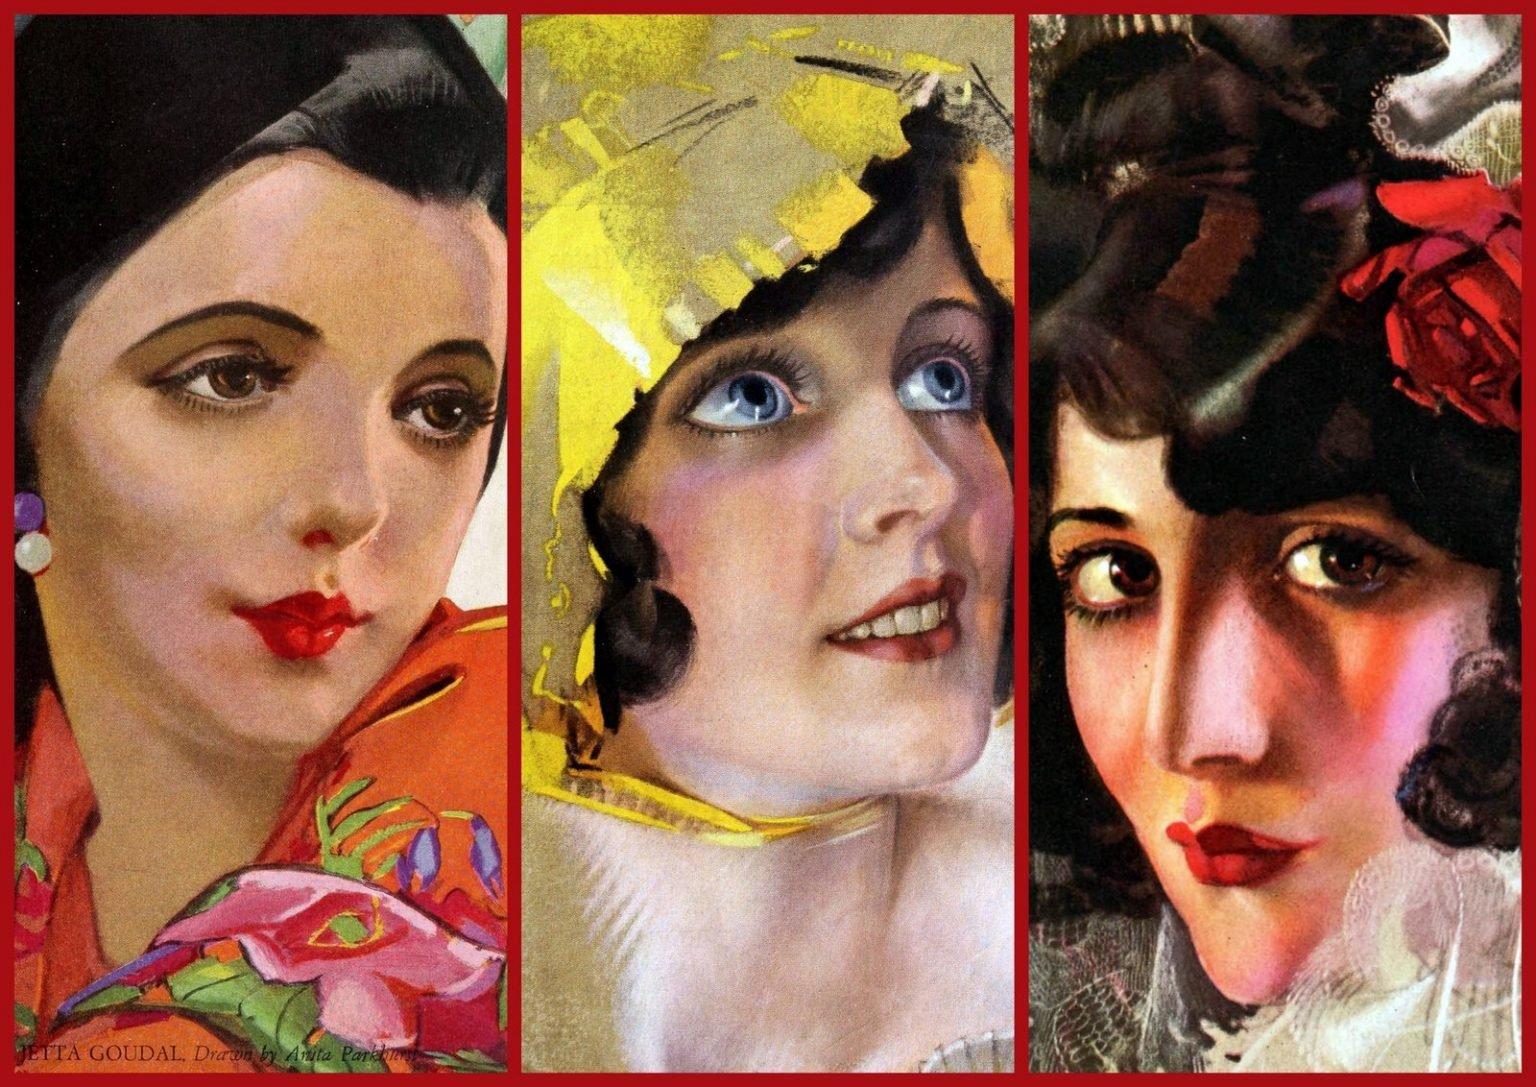 Vintage gorgeous, glamorous actresses of the 1920s